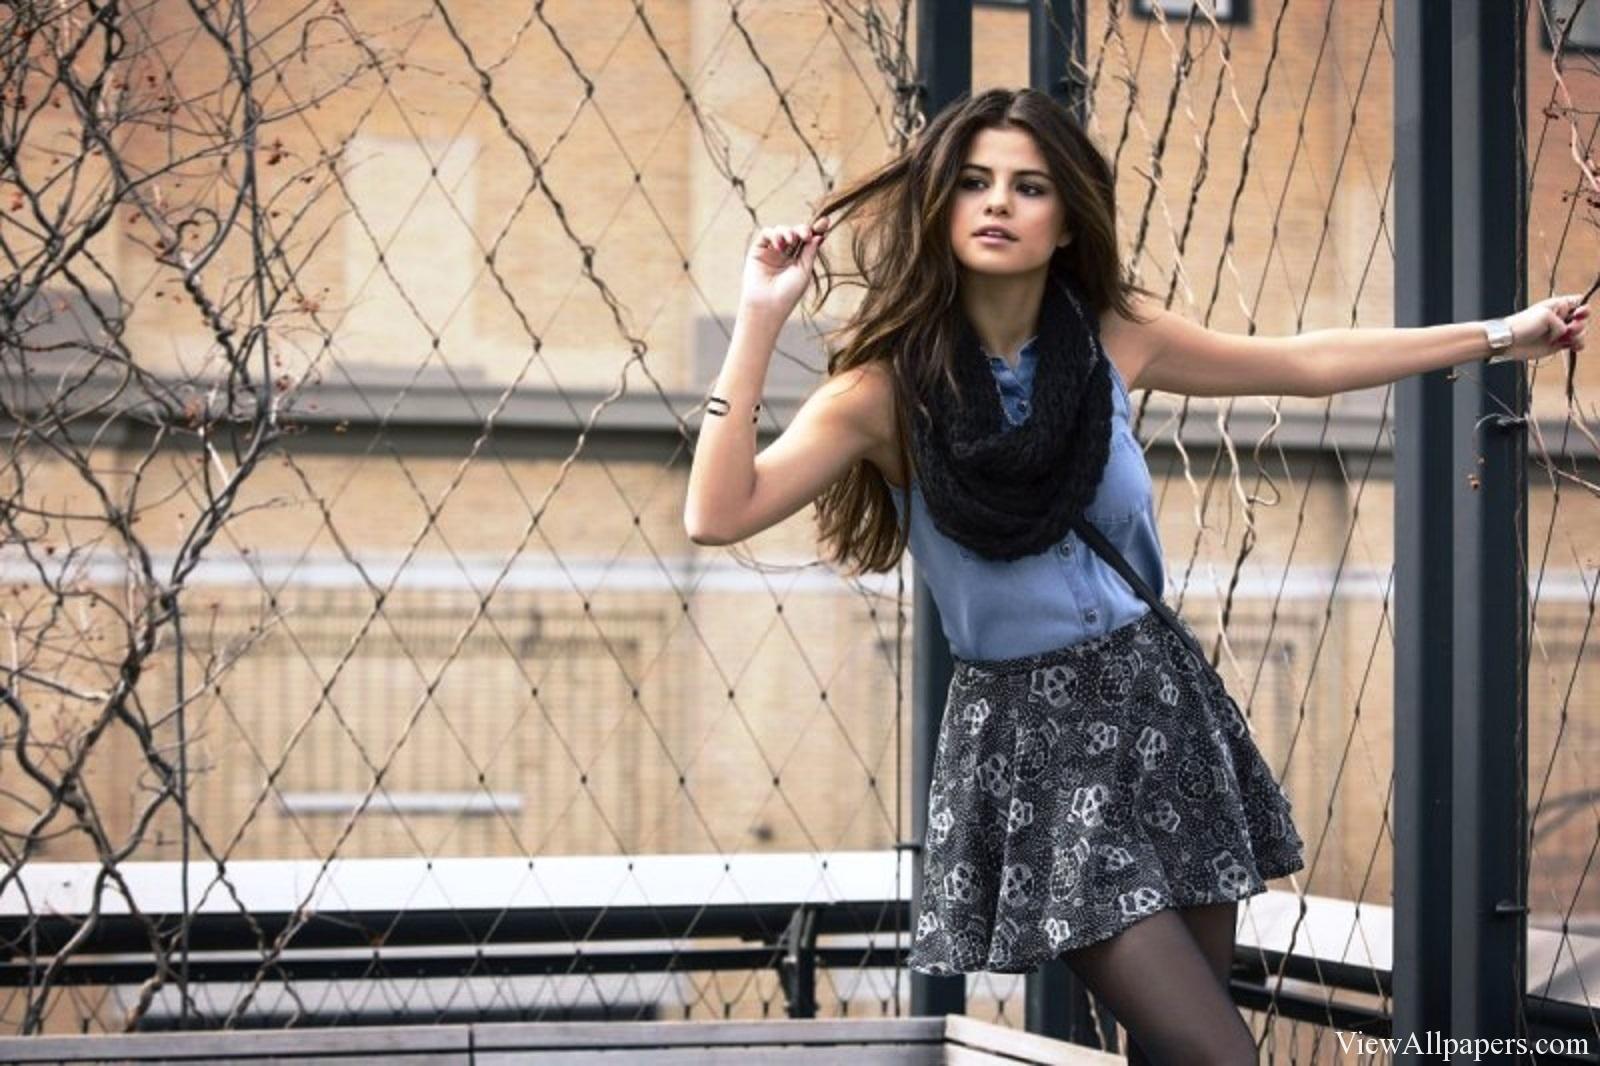 Free Download Selena Gomez 2015 Hd Wallpaper Female